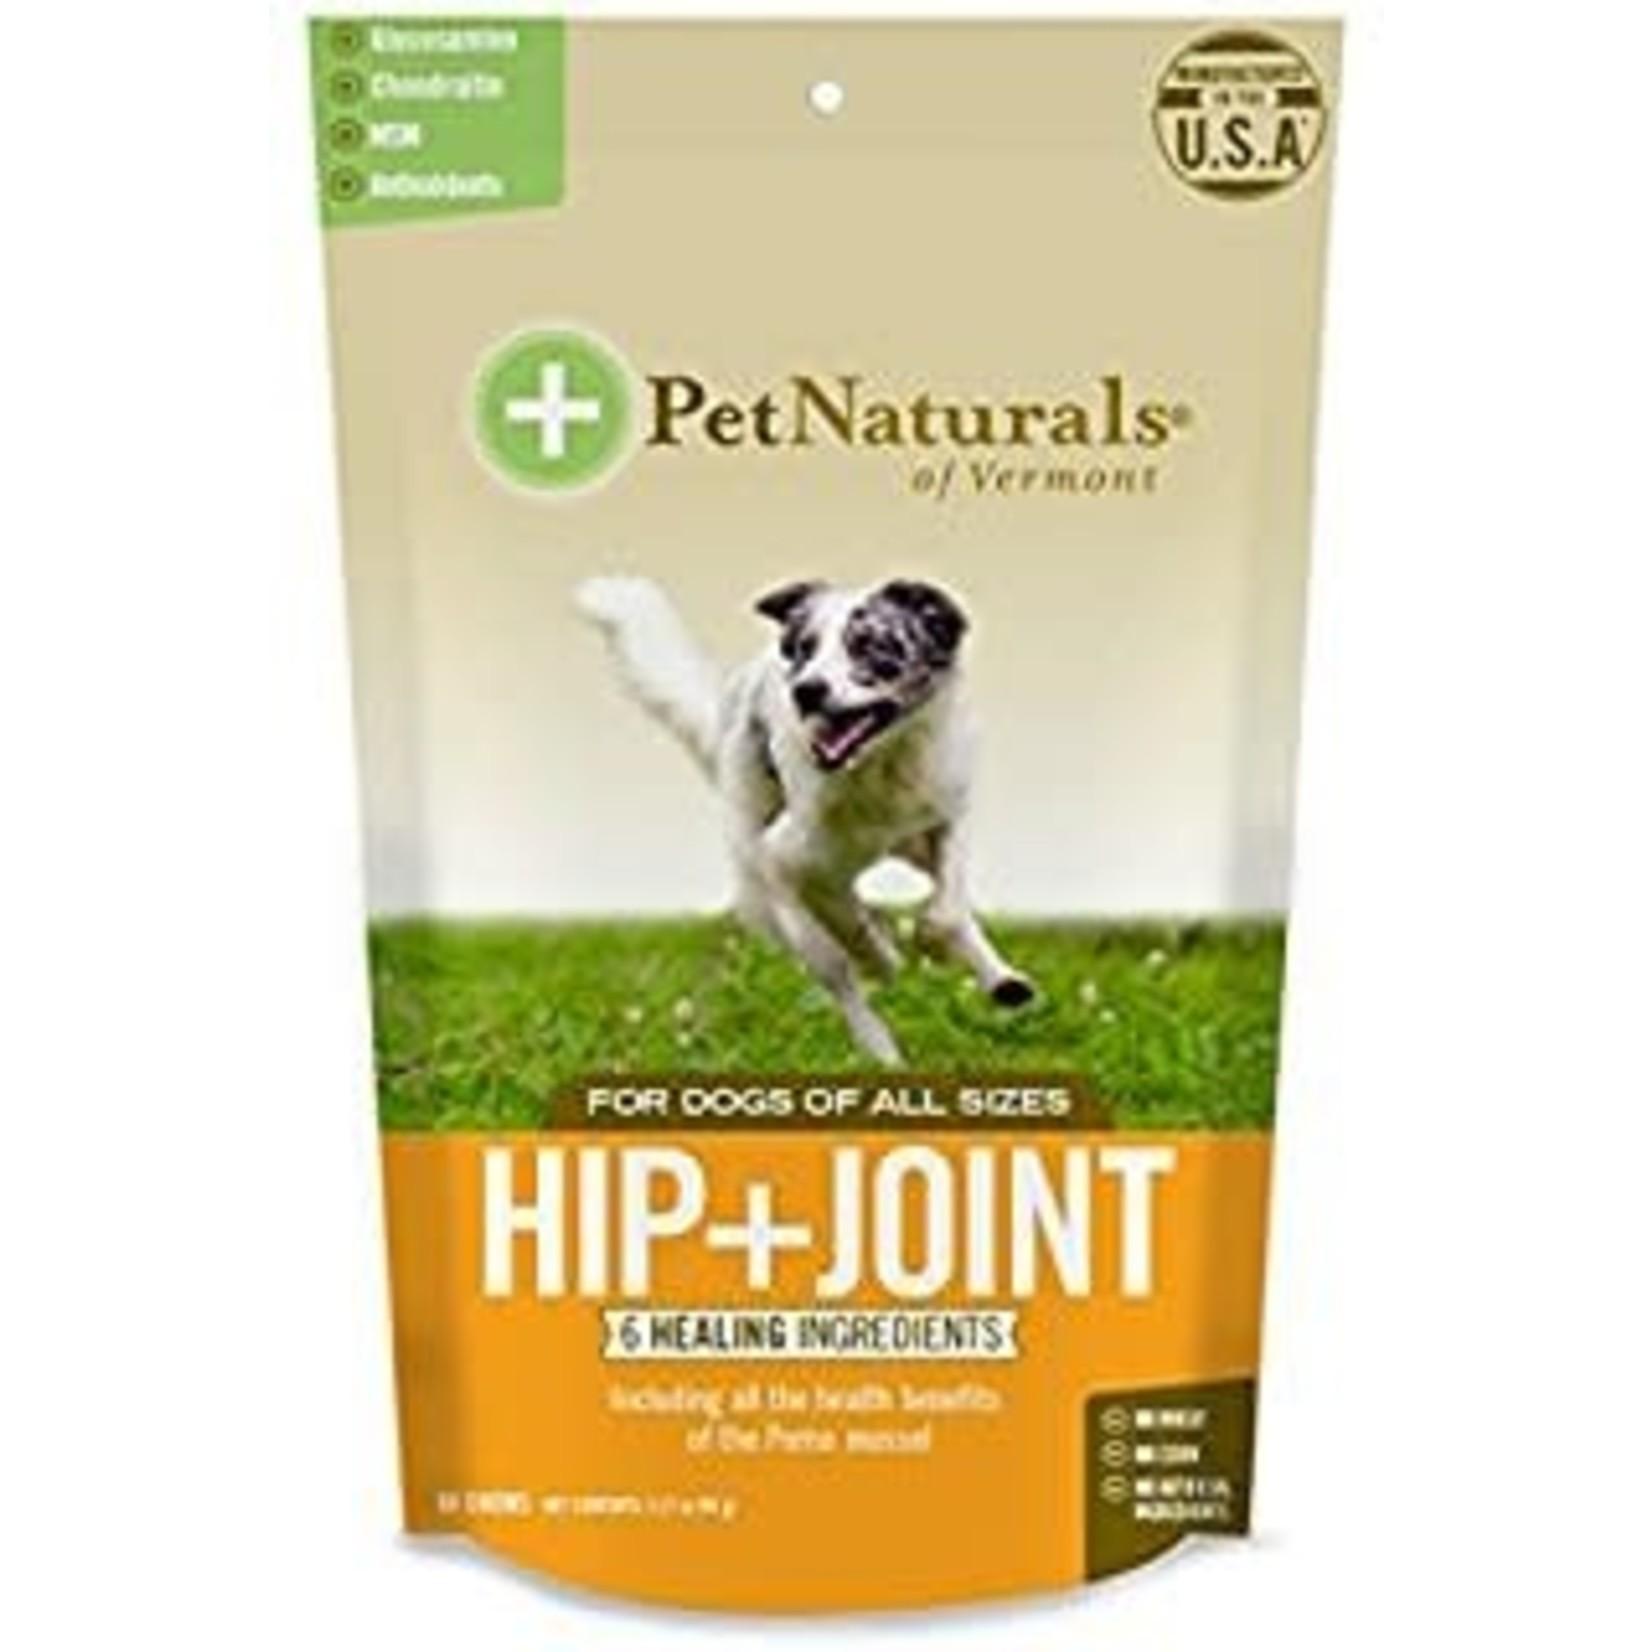 Pet Naturals of Vermont PetNaturals Hip + Joint Dog Supplement Chews 60ct